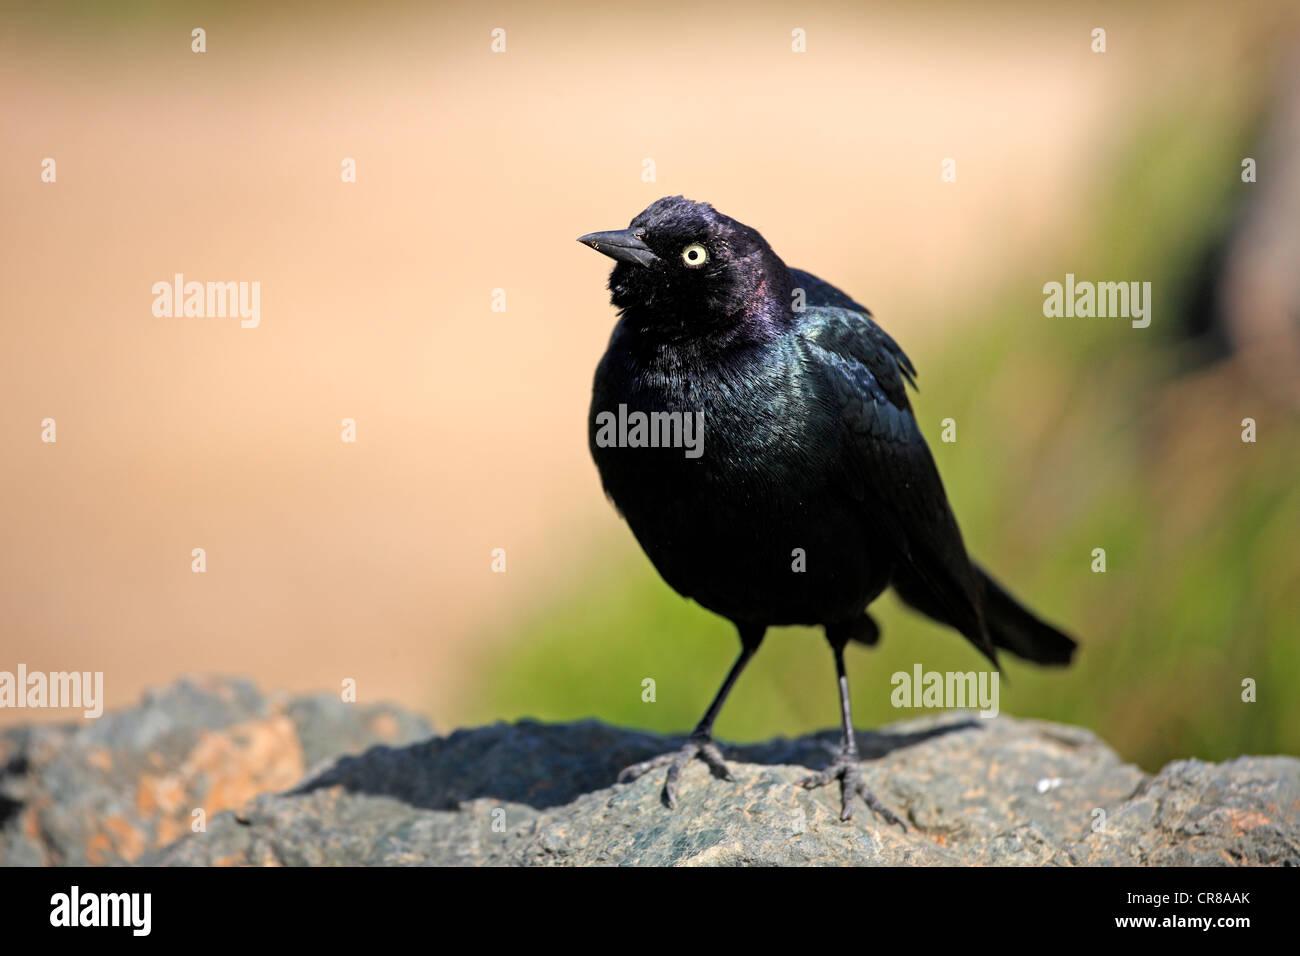 Brewer's blackbird (Euphagus cyanocephalus), adult, California, USA - Stock Image